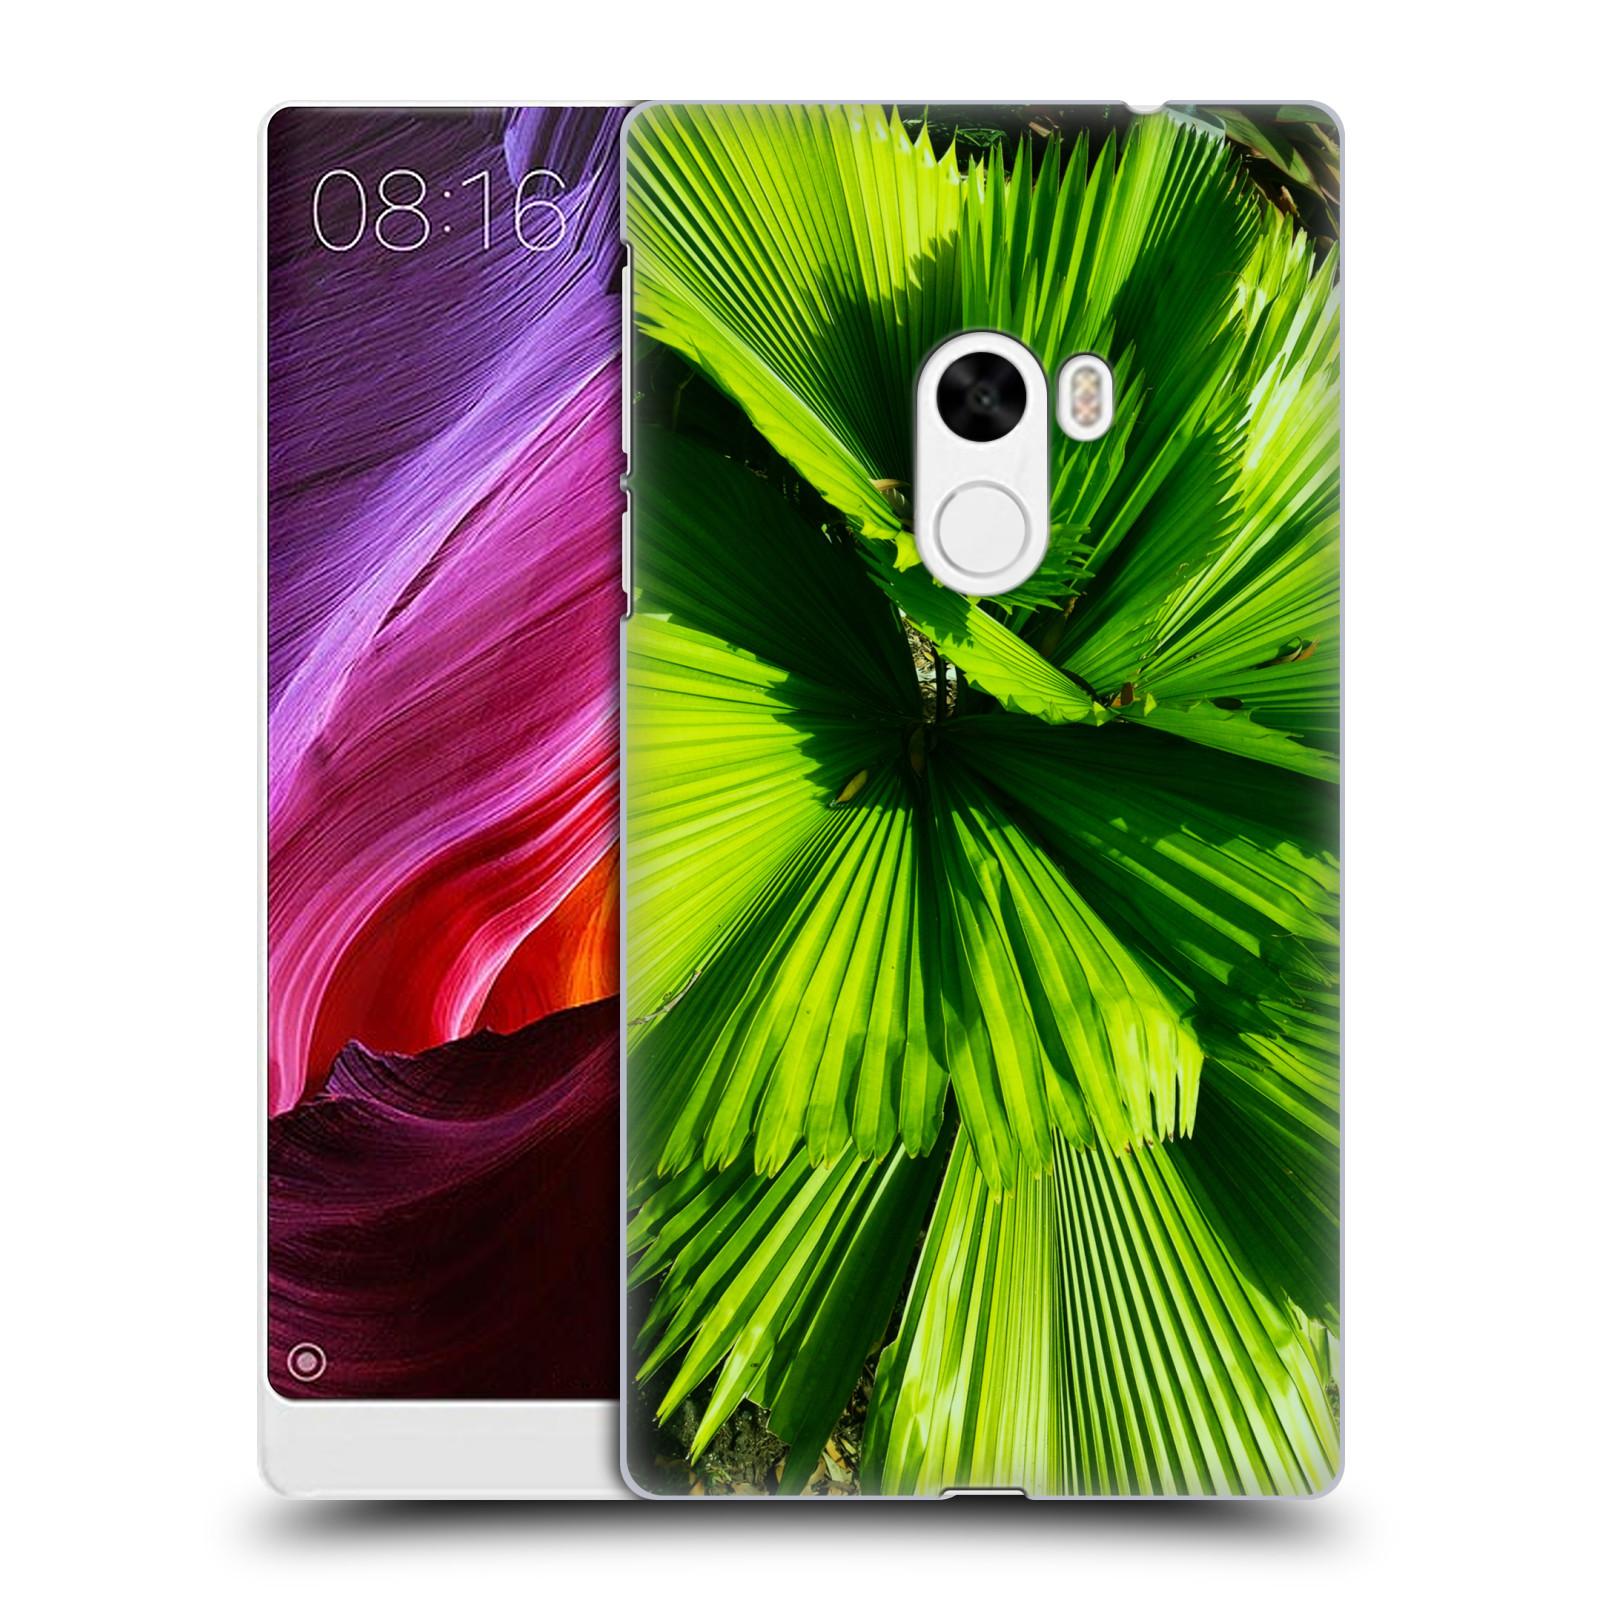 OFFICIAL-PETER-BARREDA-NATURE-HARD-BACK-CASE-FOR-XIAOMI-PHONES